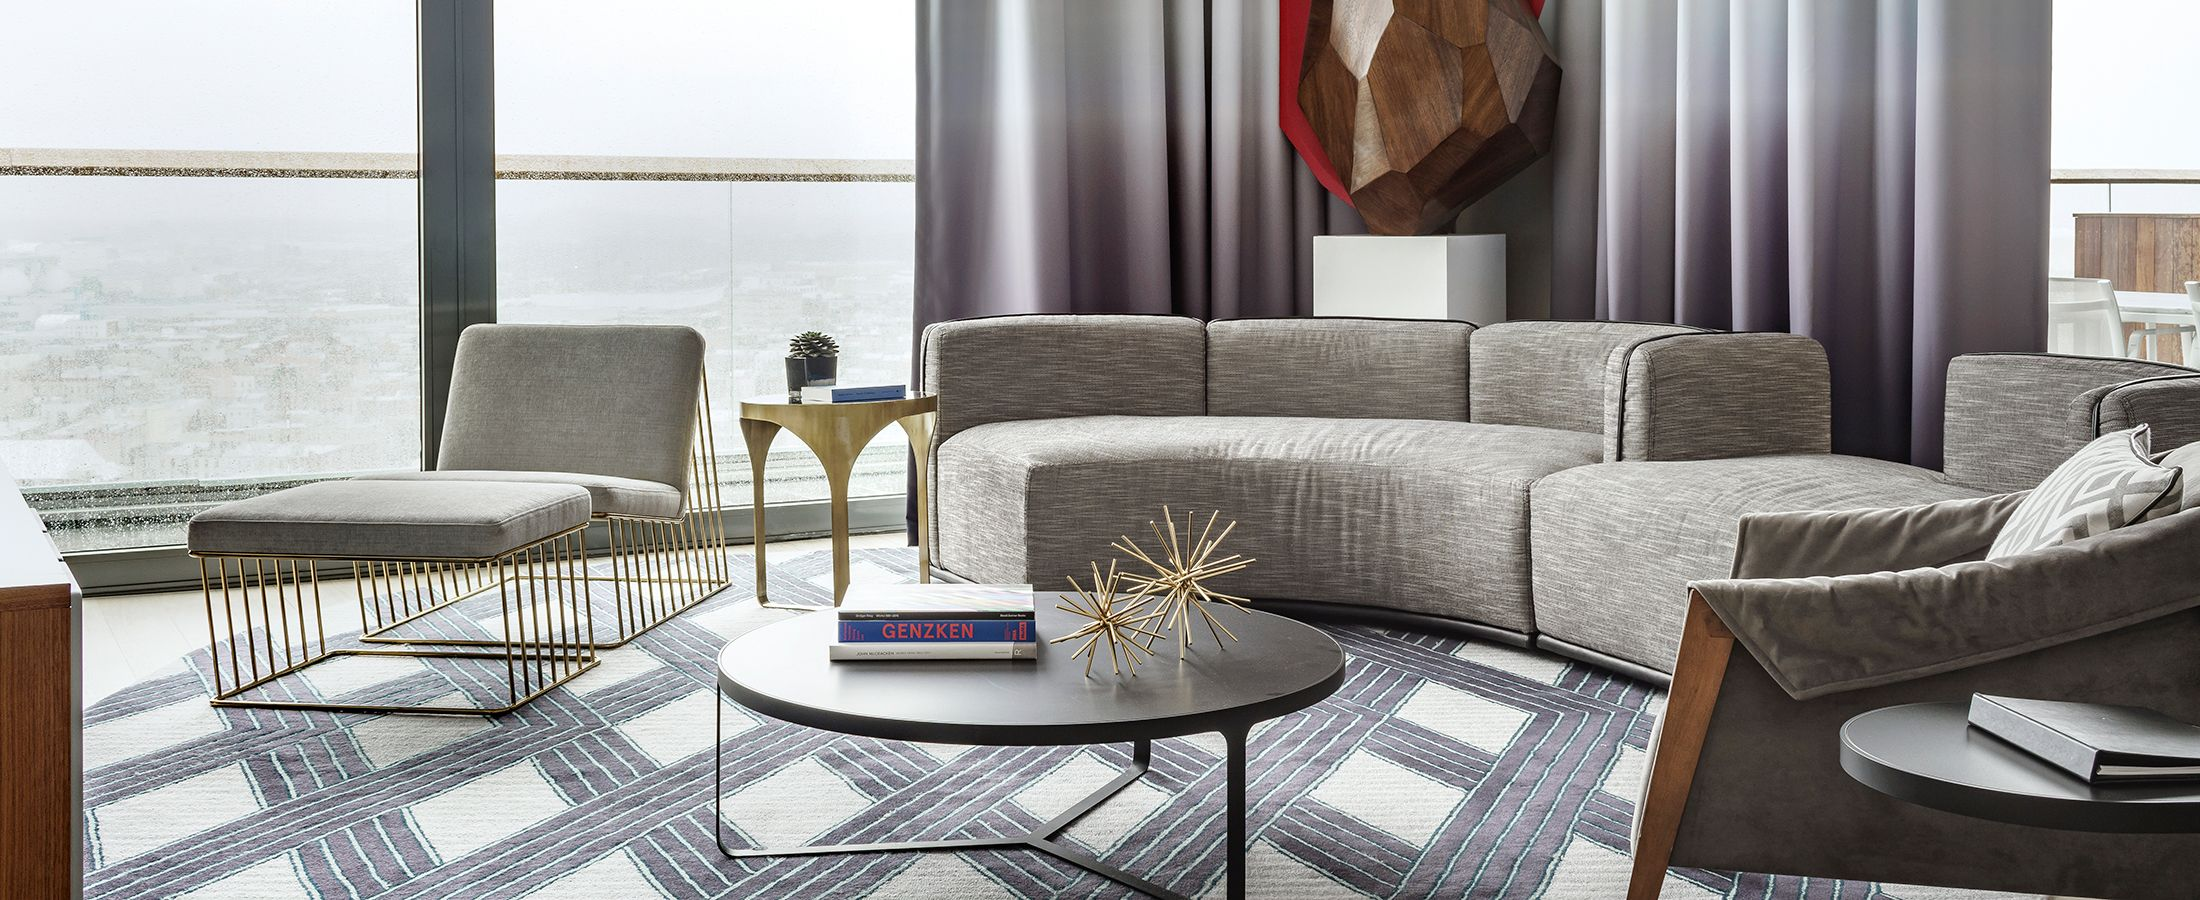 the william vale brooklyn ny interior design by studio munge rh pinterest com au